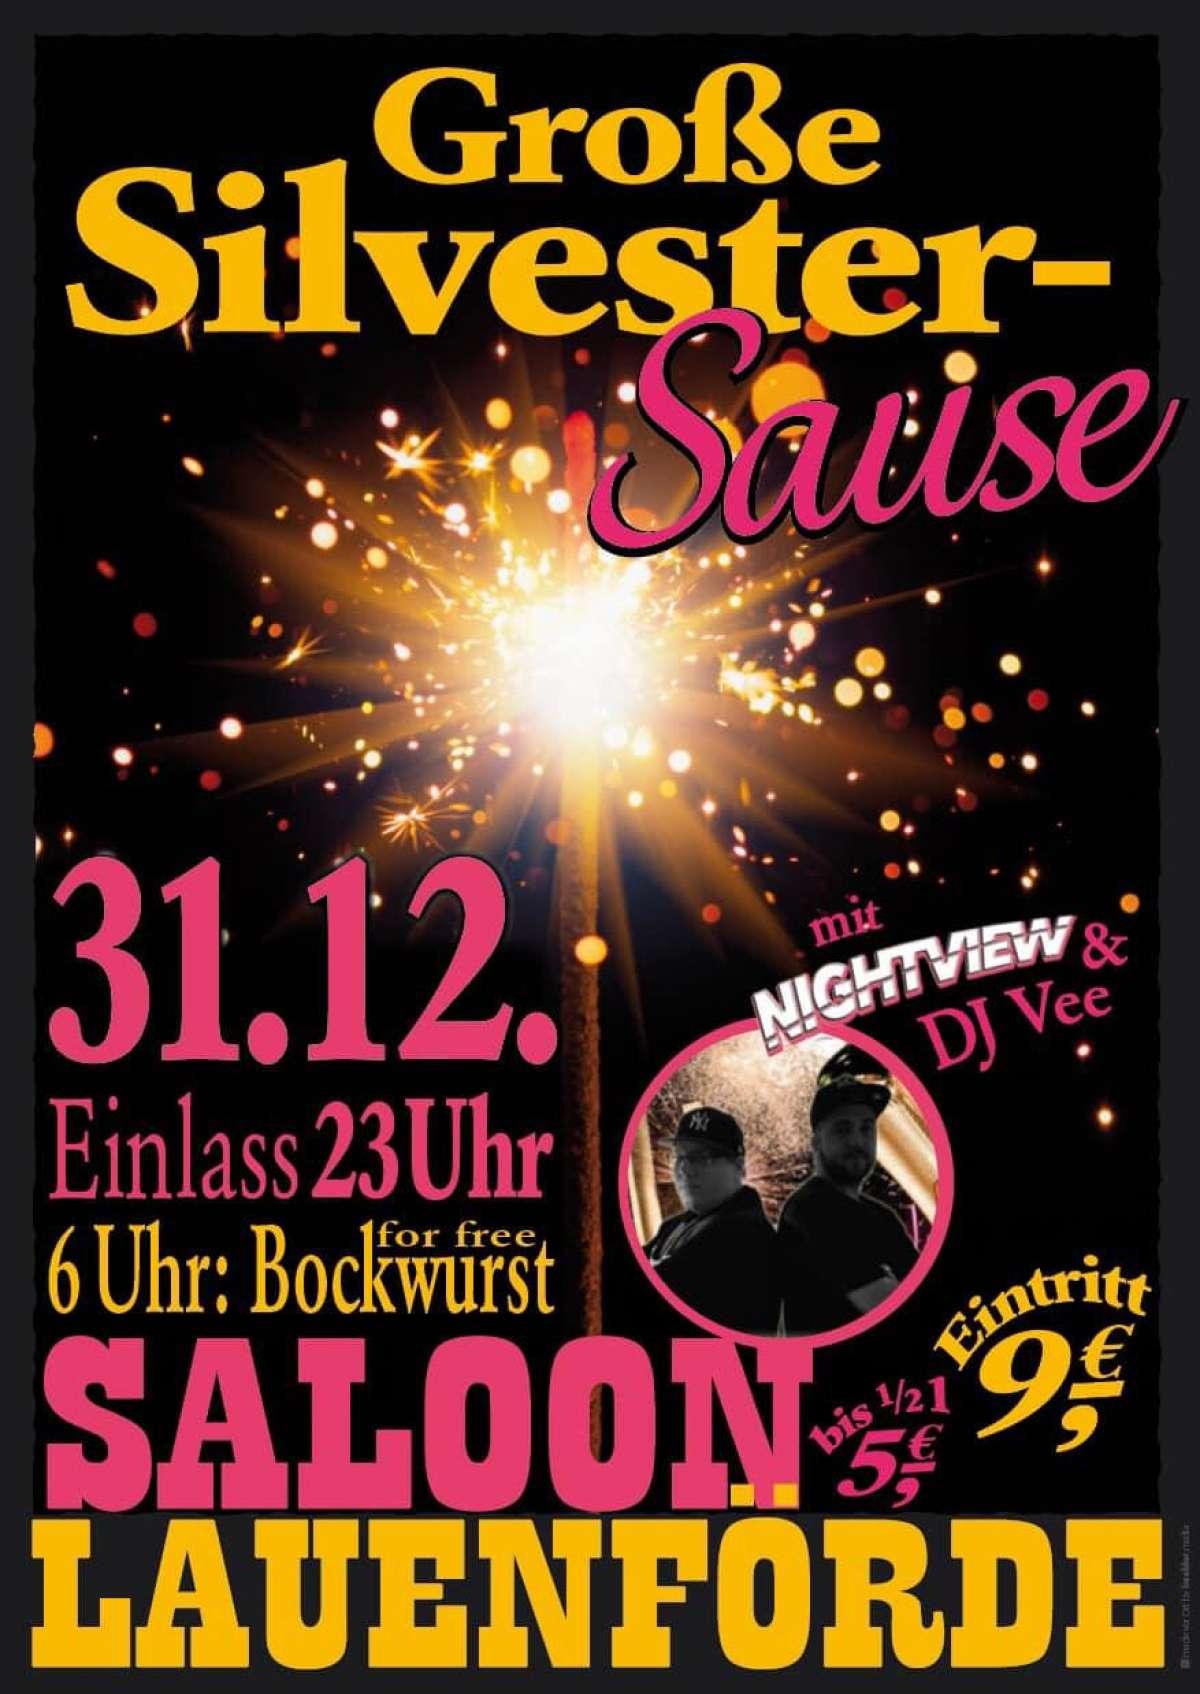 Große Silvester-Sause - Nightview & DJ Vee - Saloon  - Lauenförde